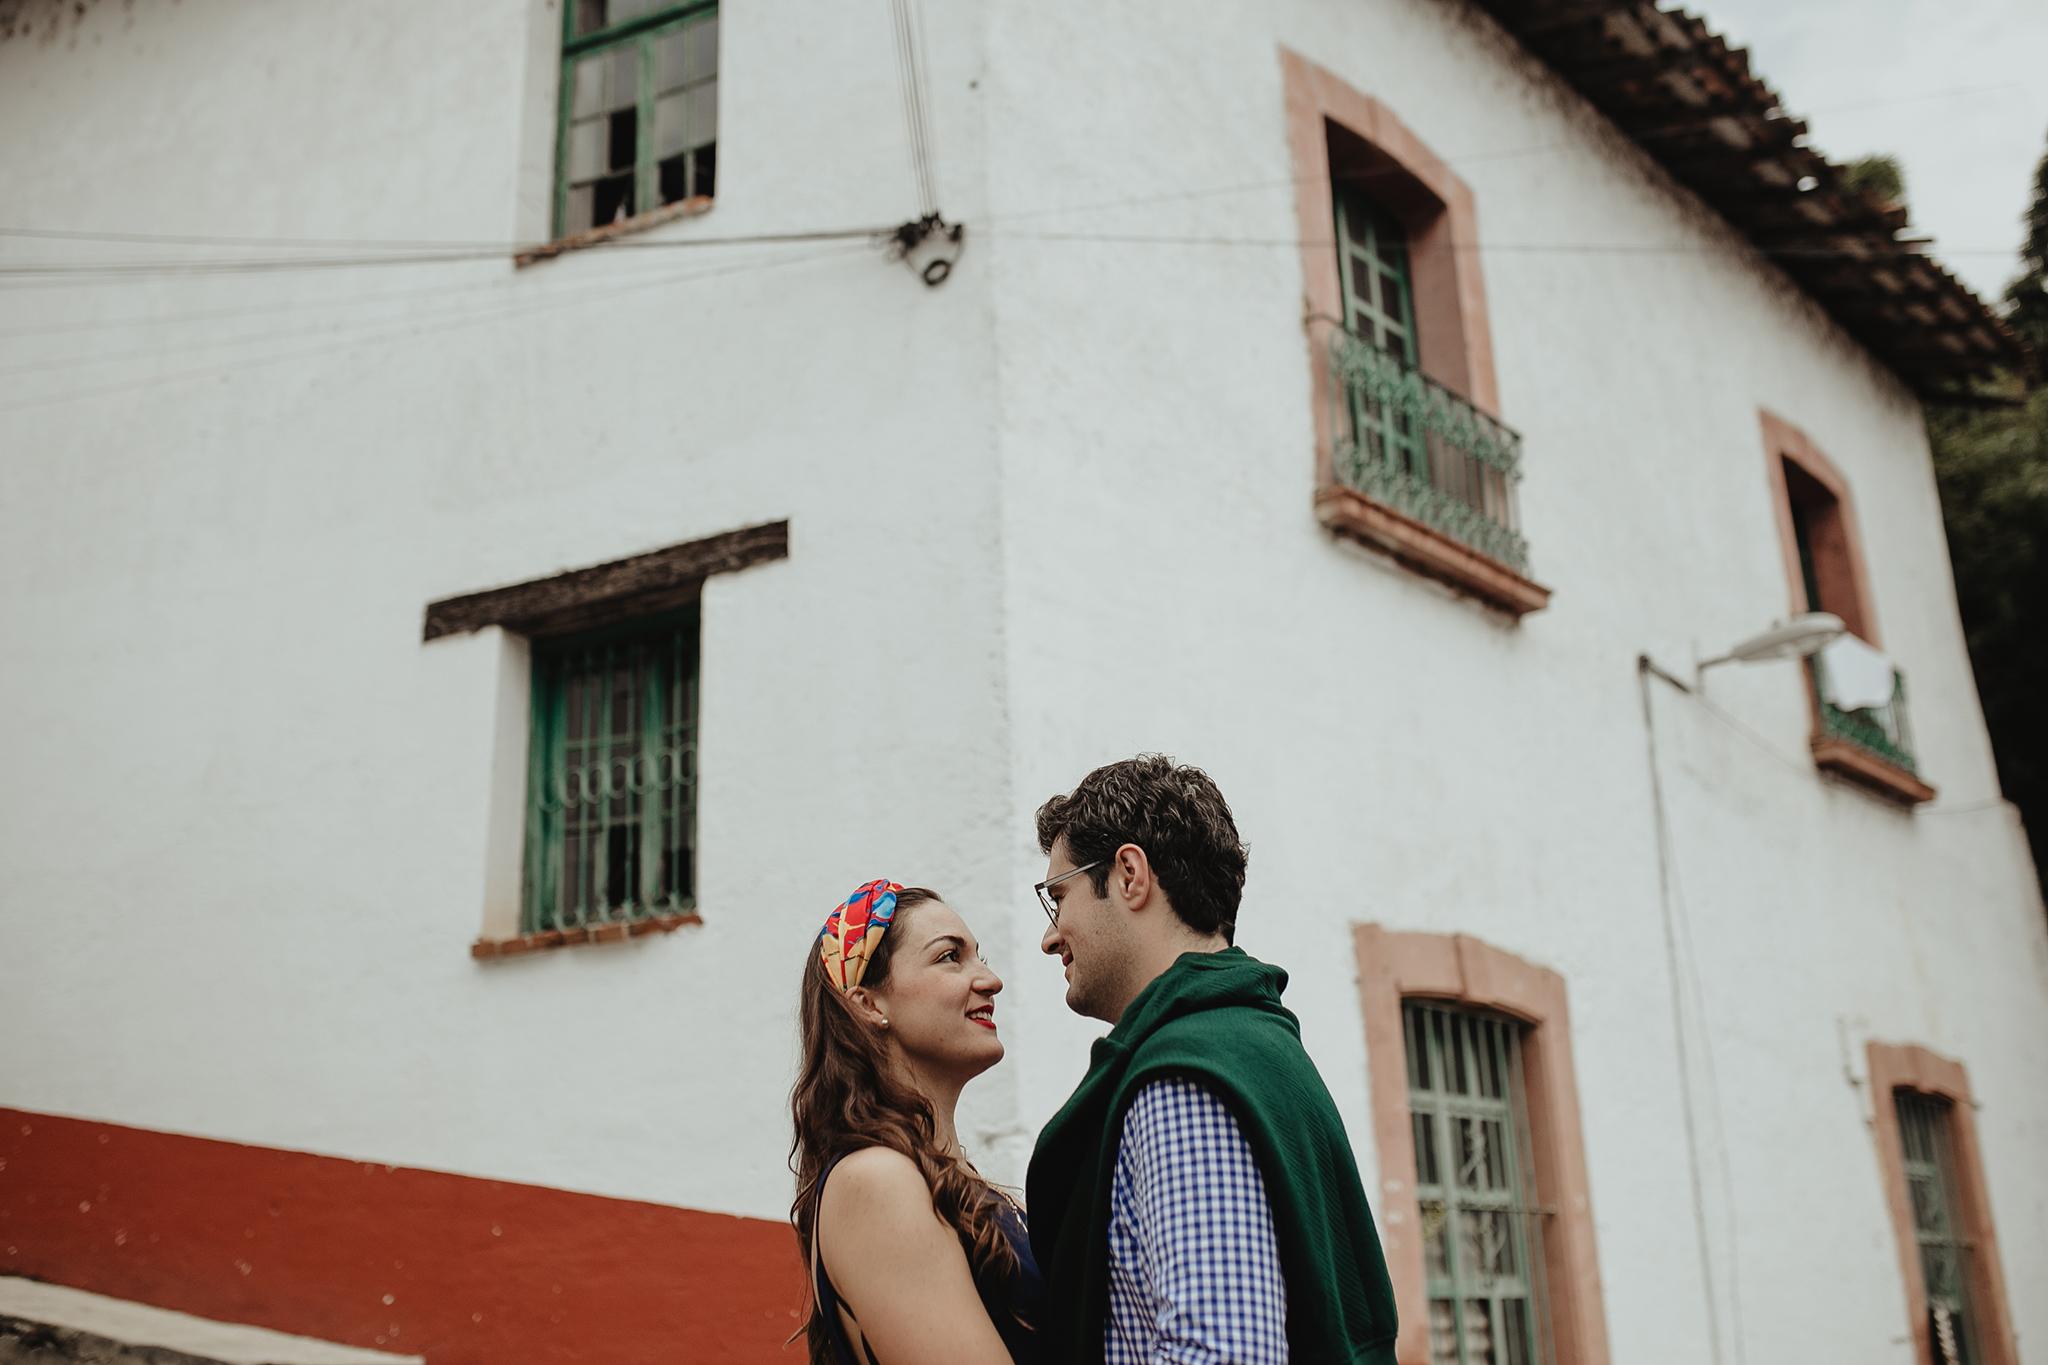 0412L&R_nevado_engagement_WeddingPhotography_Wedding_Boda_WeddingDestination_BodasYucatan.jpg